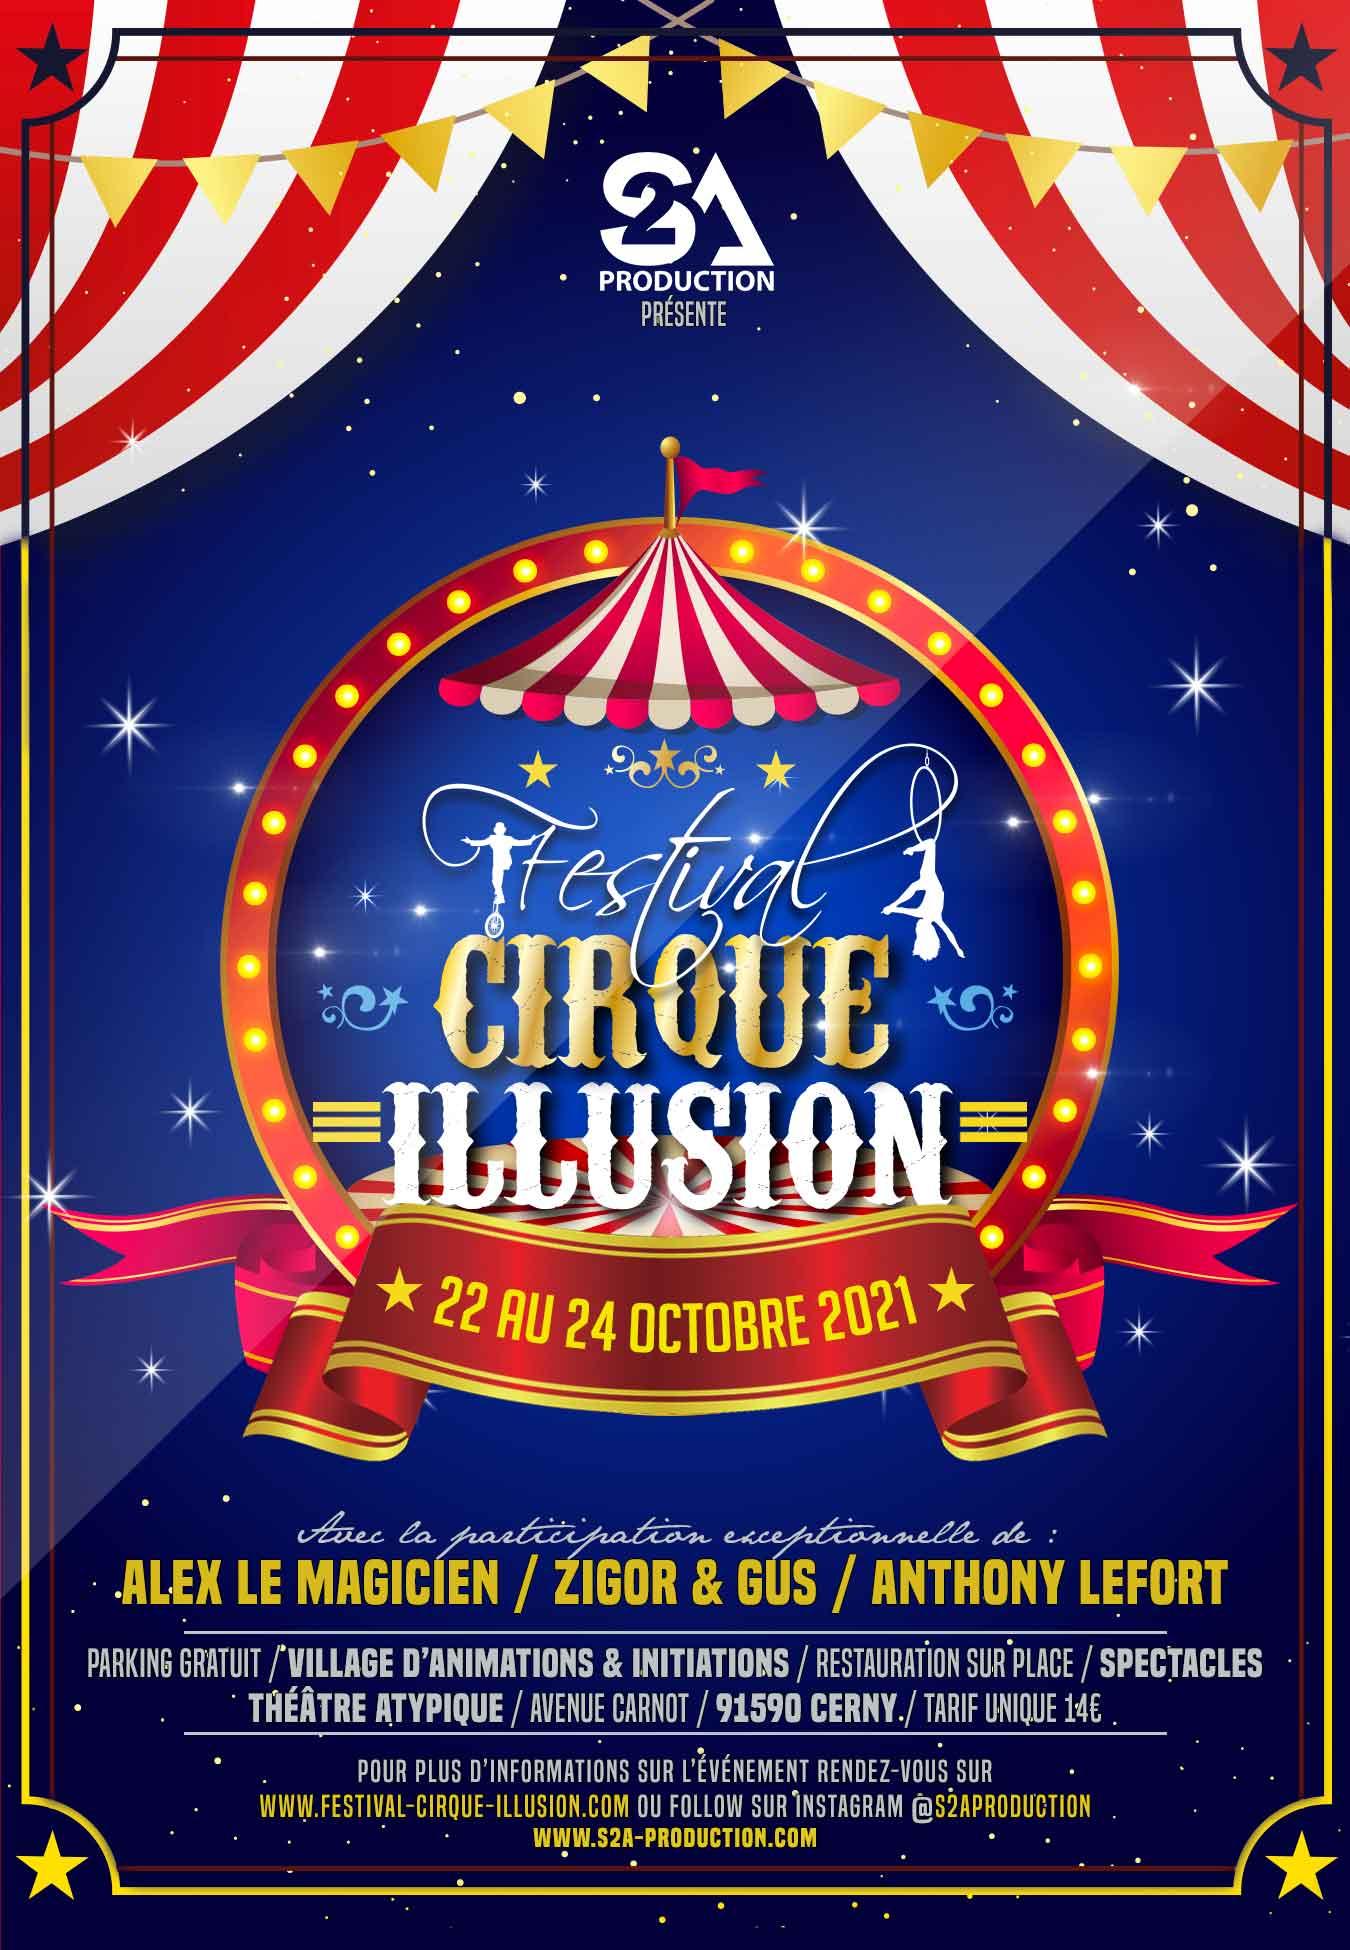 Affiche festival cirque et illusion cerny